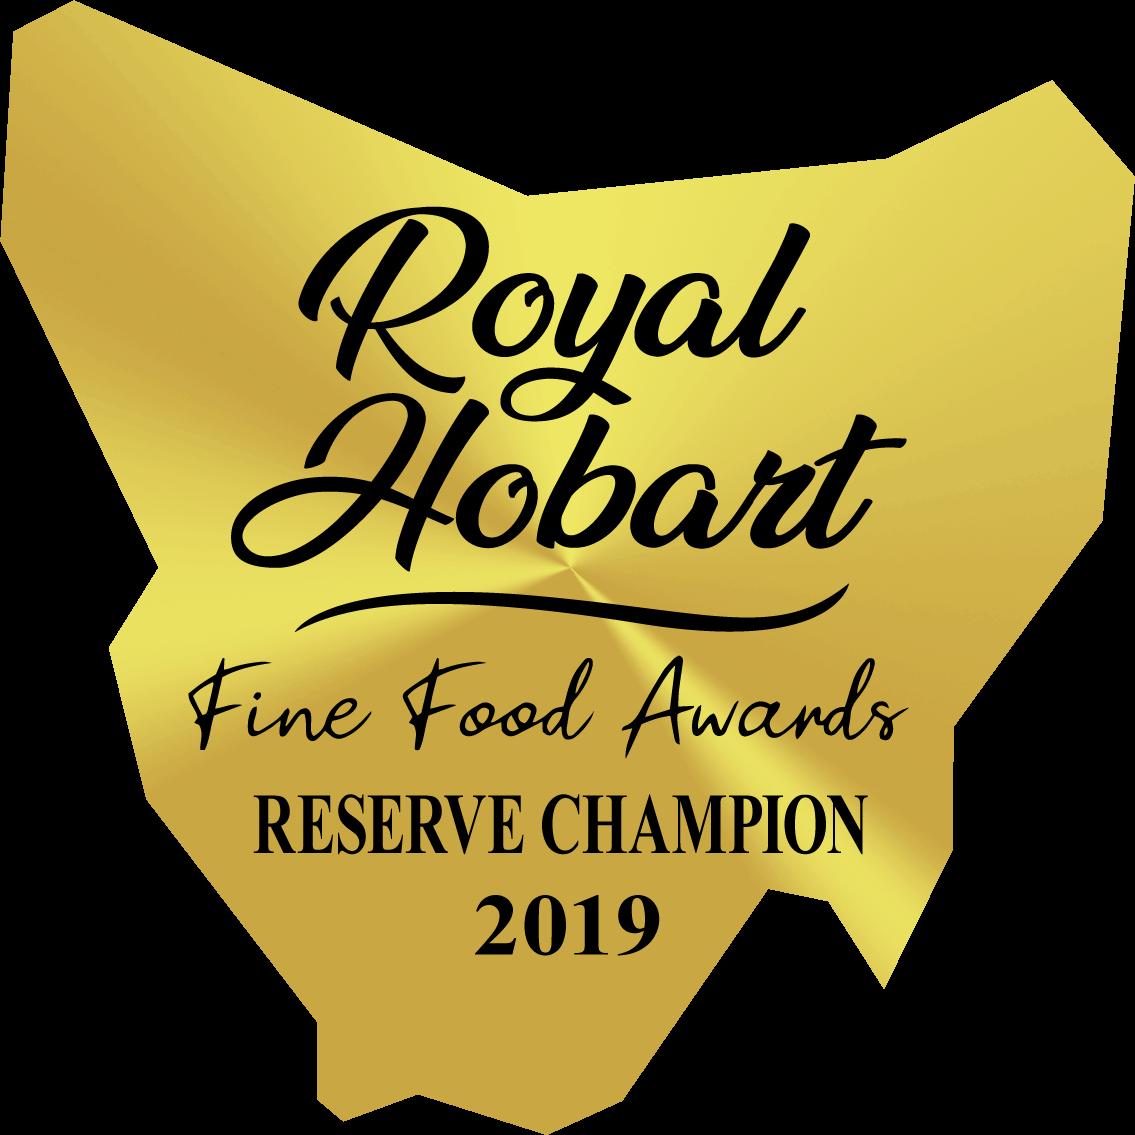 RH 2019 Reserve Champion.png